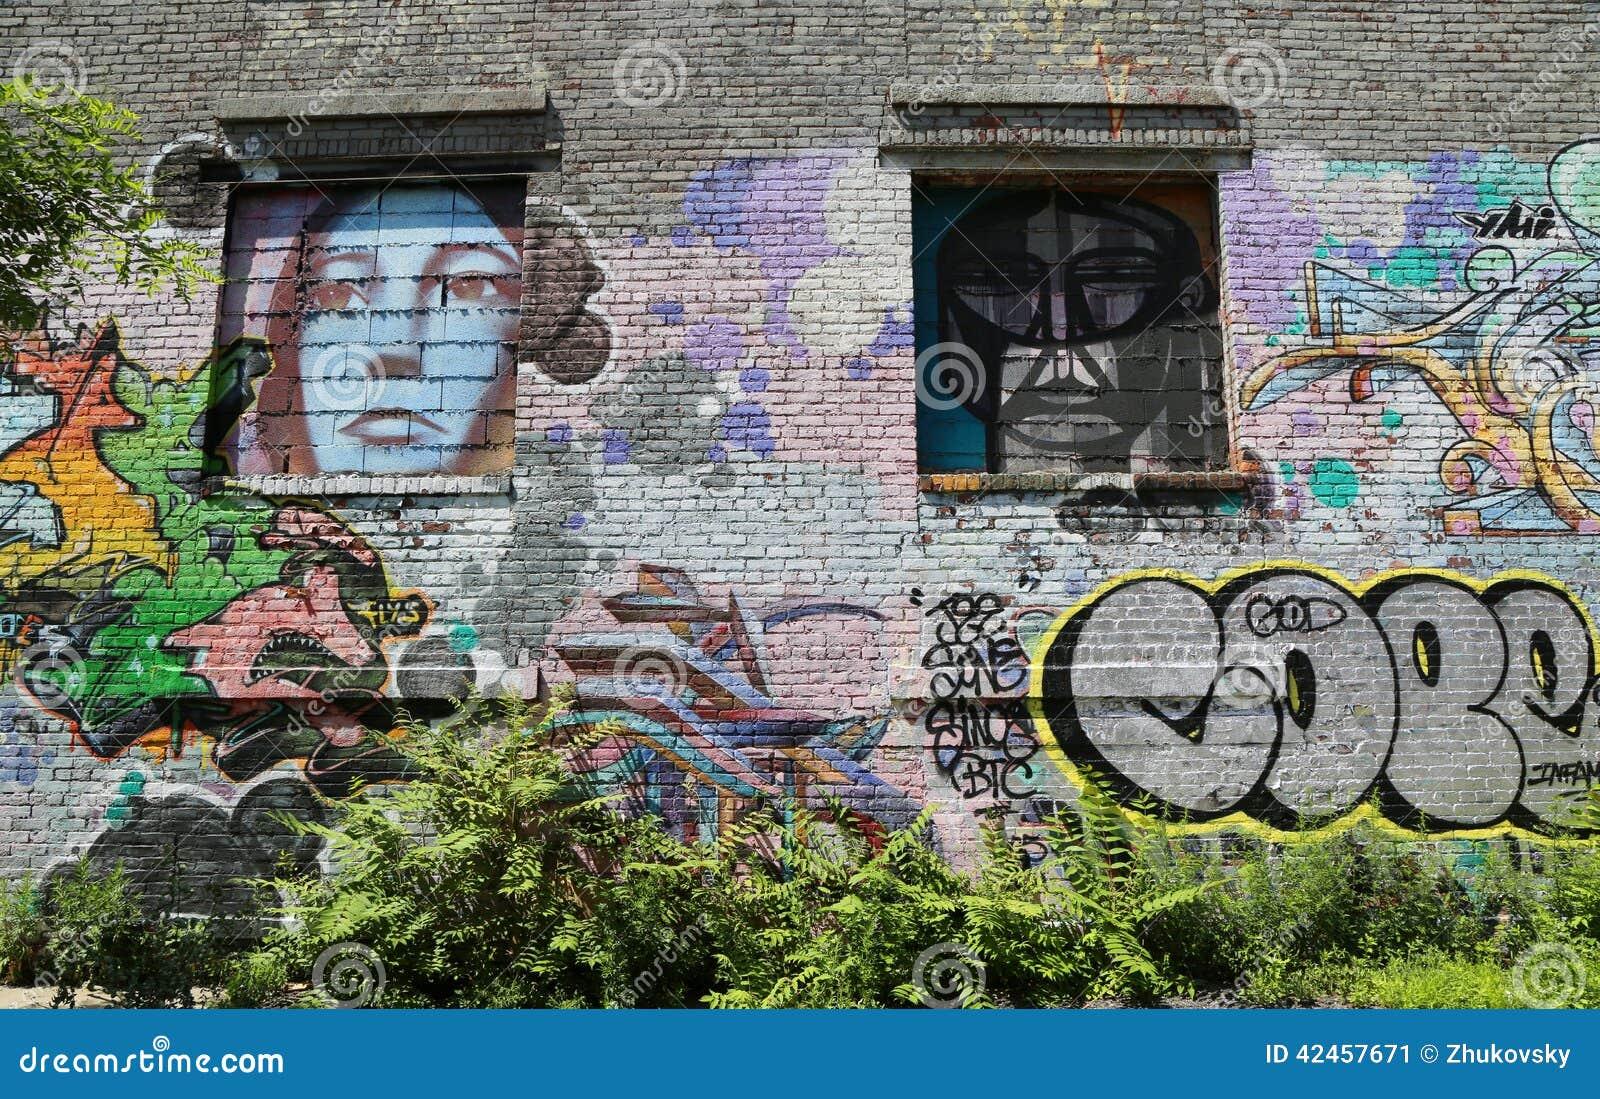 Wandgemälde in Williamsburg-Abschnitt in Brooklyn